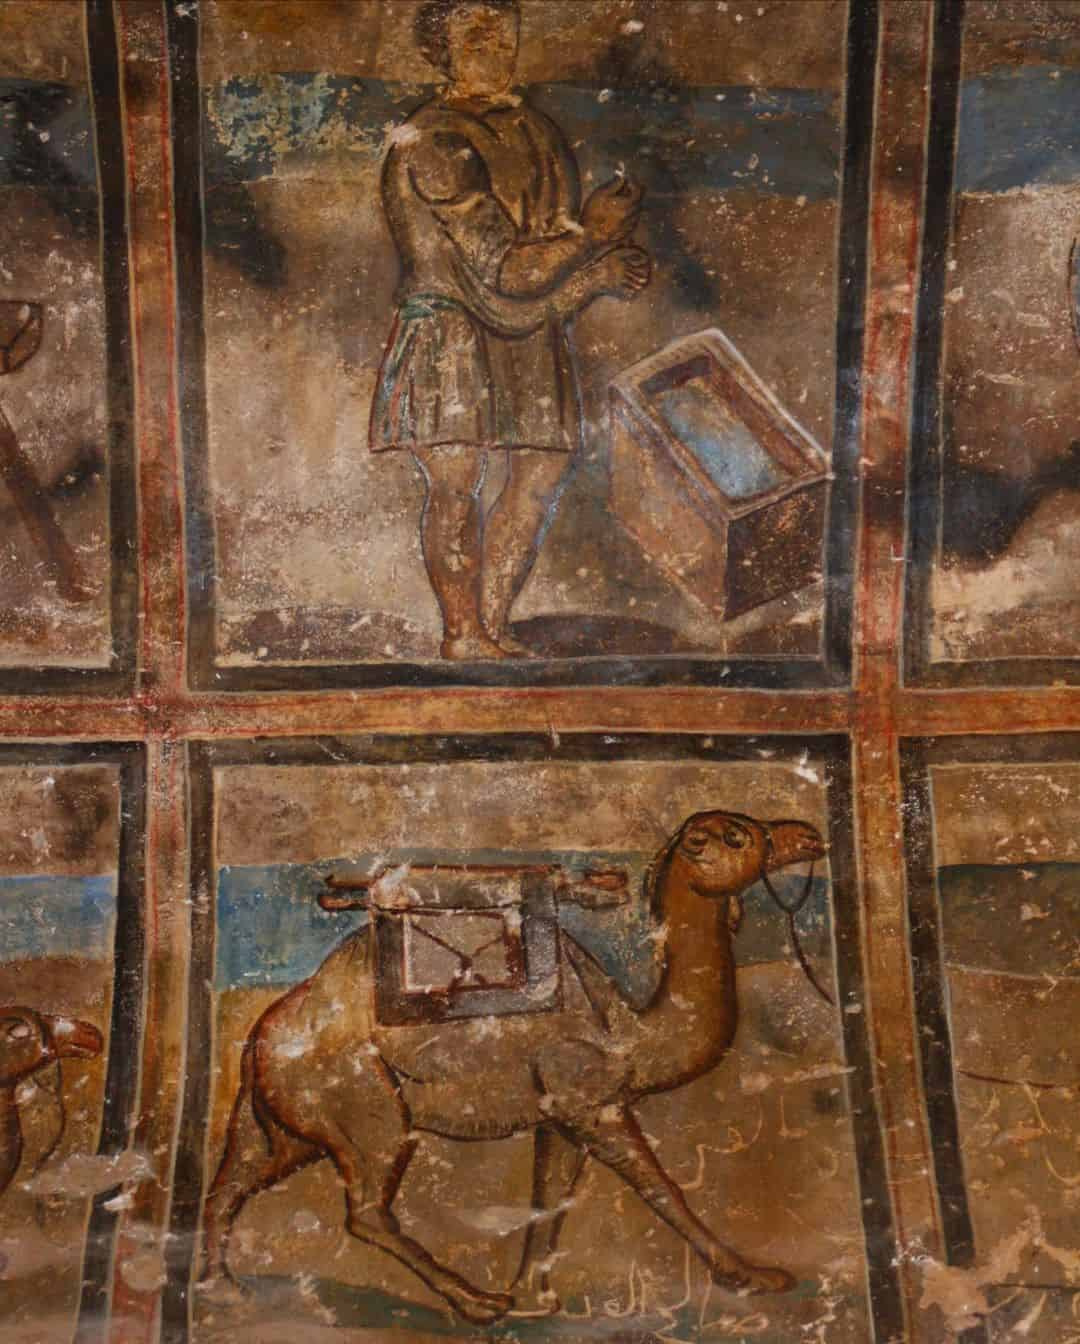 Wall paintings inside Qasr Amra